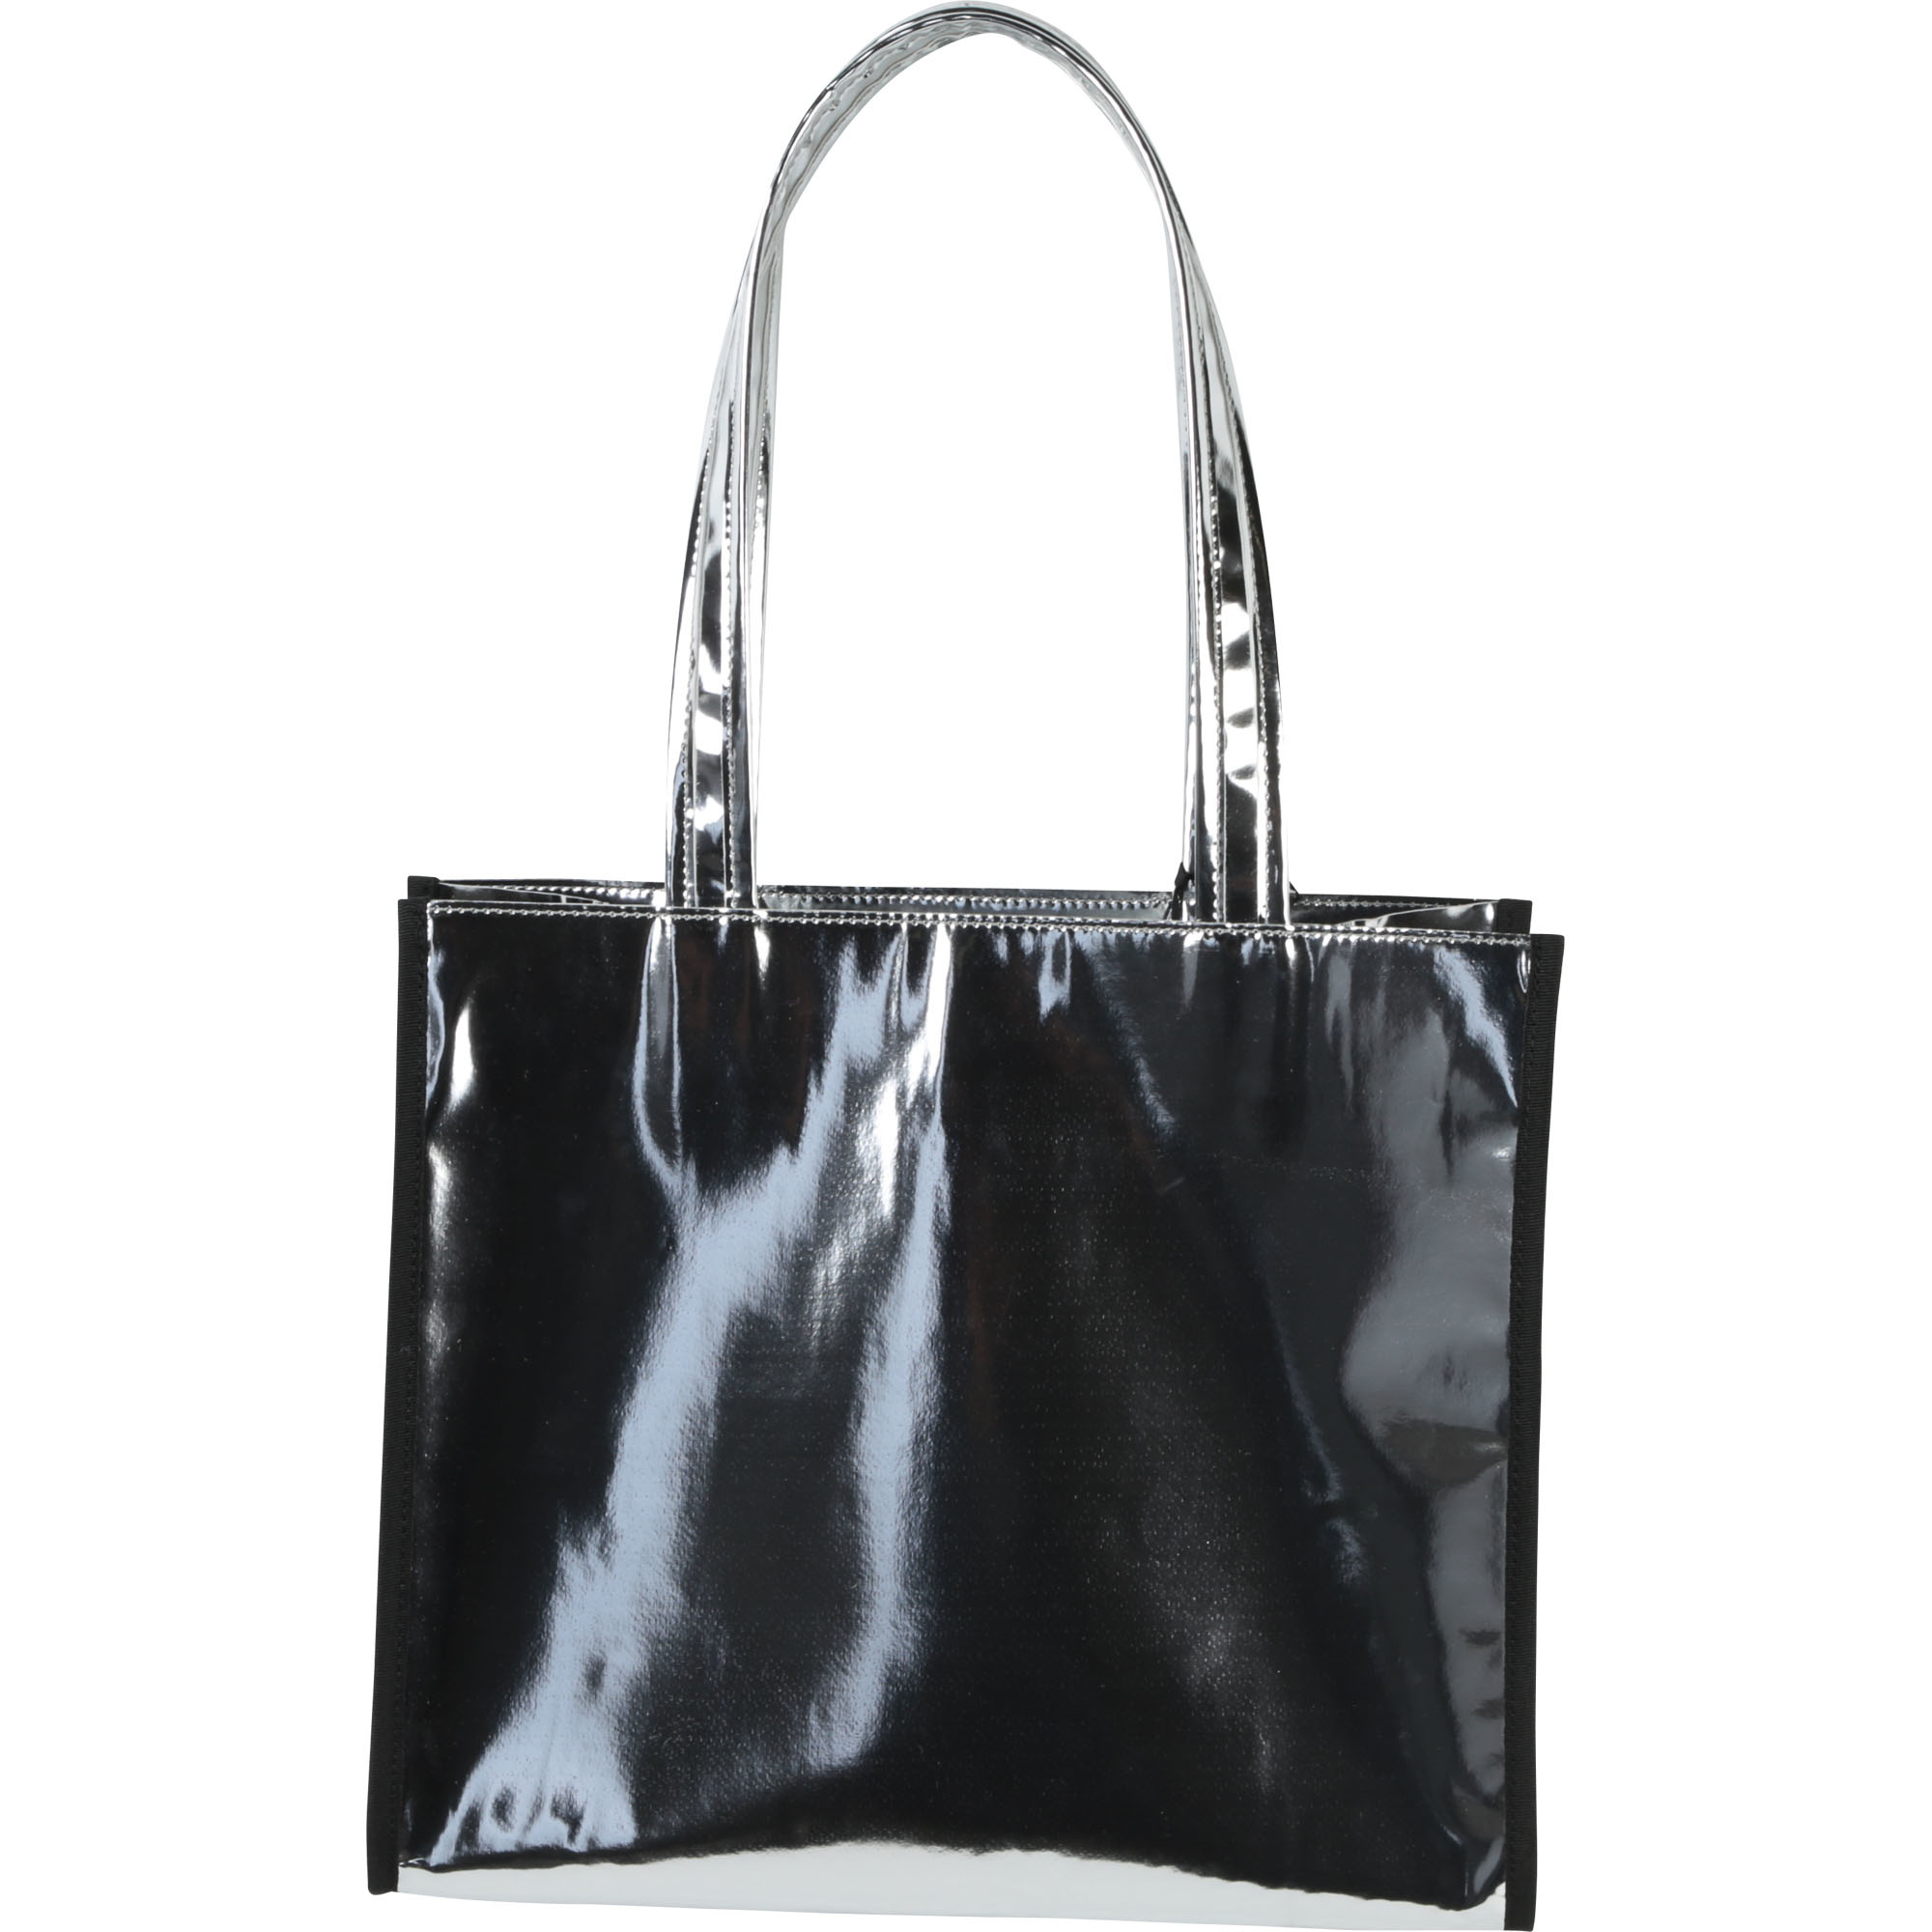 DKNY sac cabas effet miroir-2